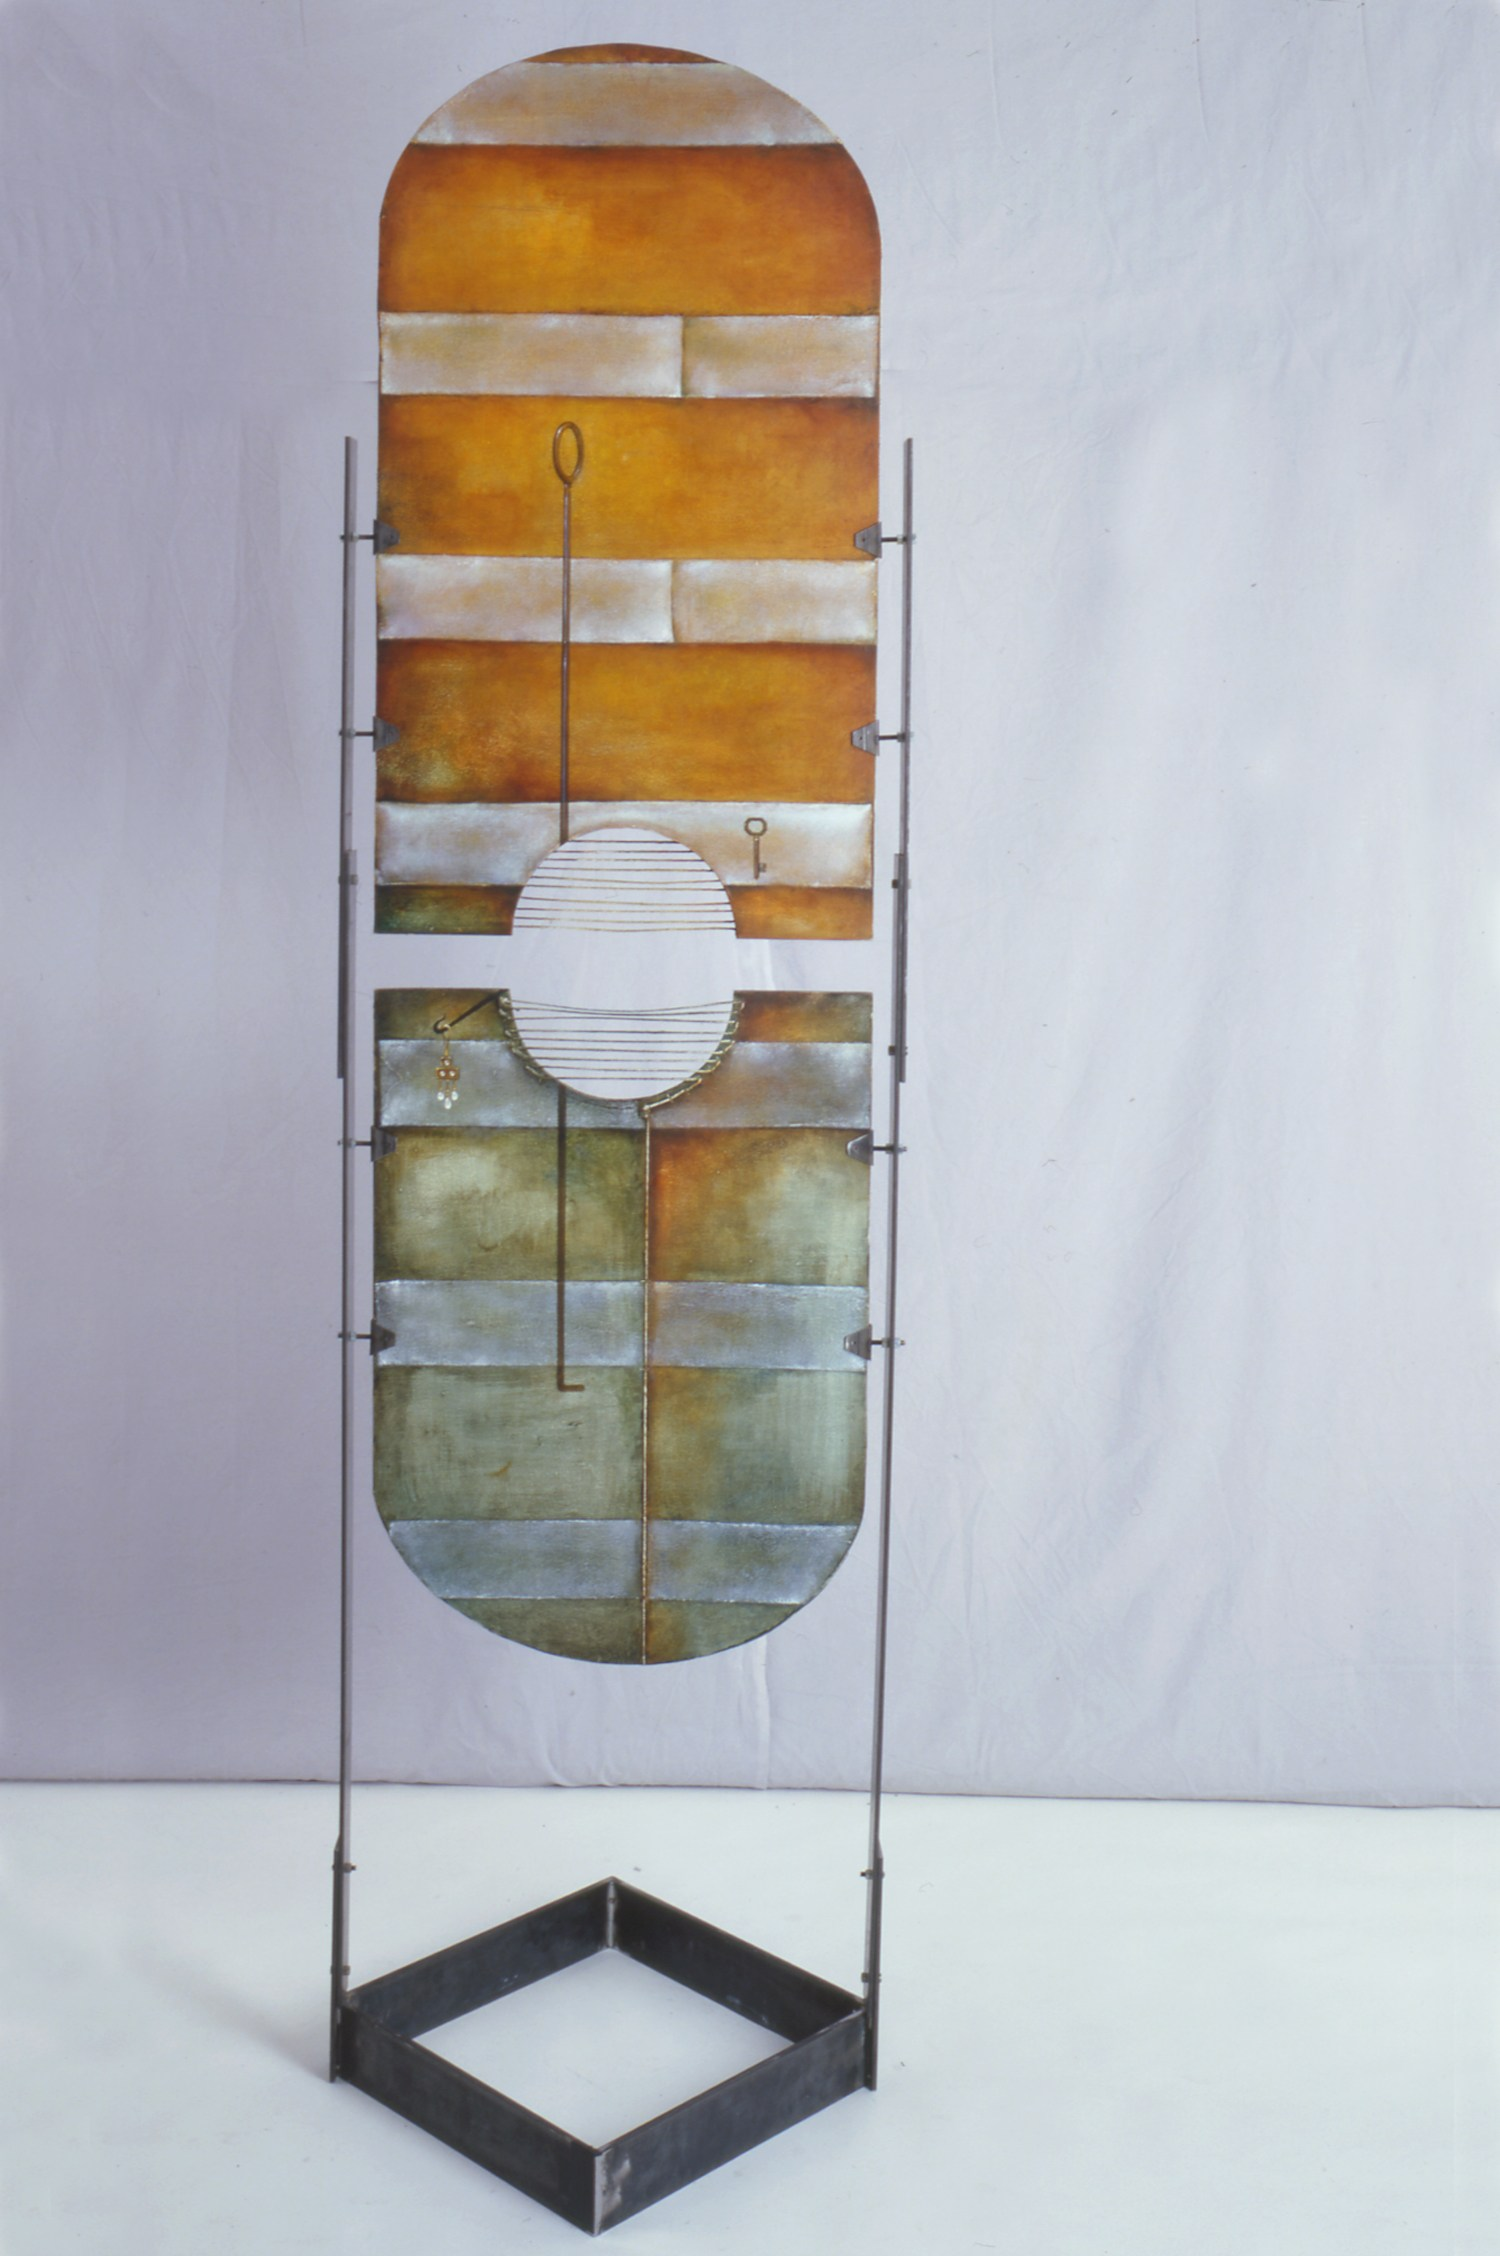 le-due-tavole-02-olio-tavola-e-ferro-210x57x75